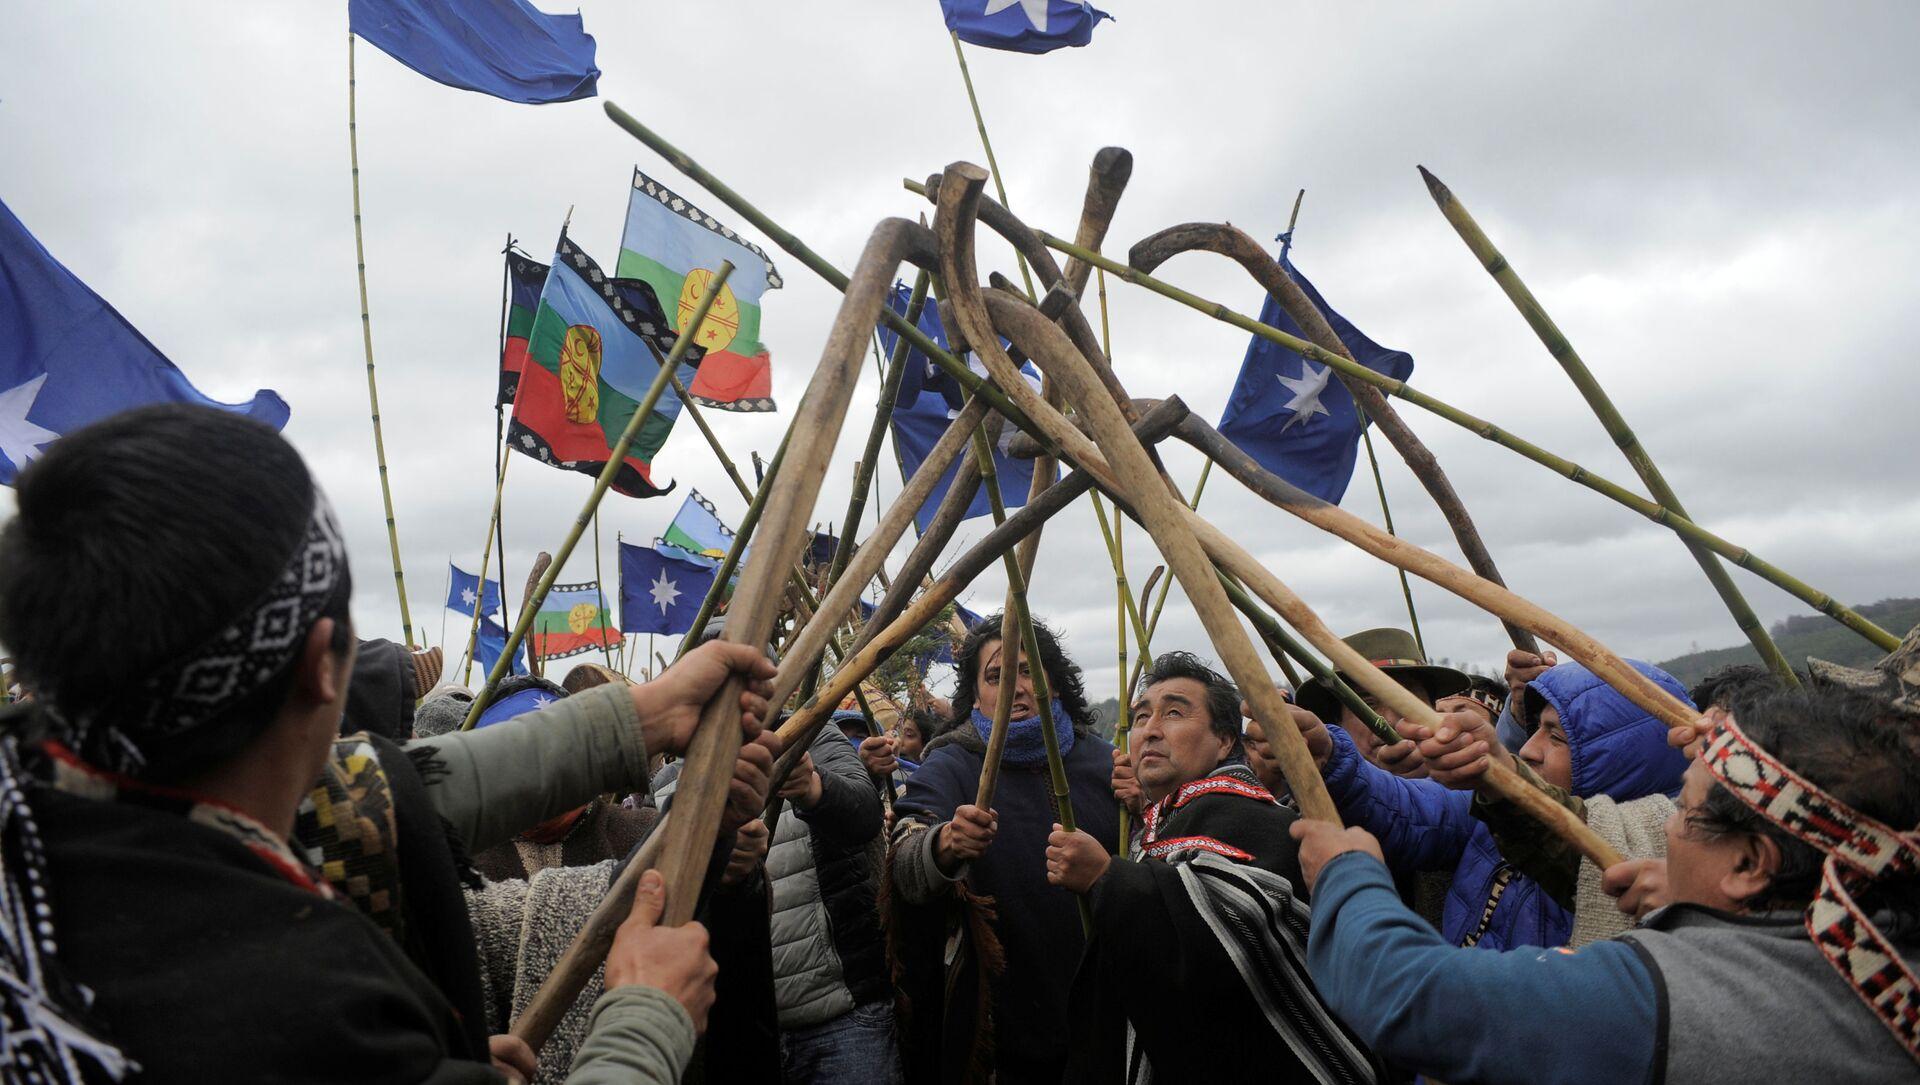 Protesta de la comunidad mapuche en Chile - Sputnik Mundo, 1920, 18.08.2020